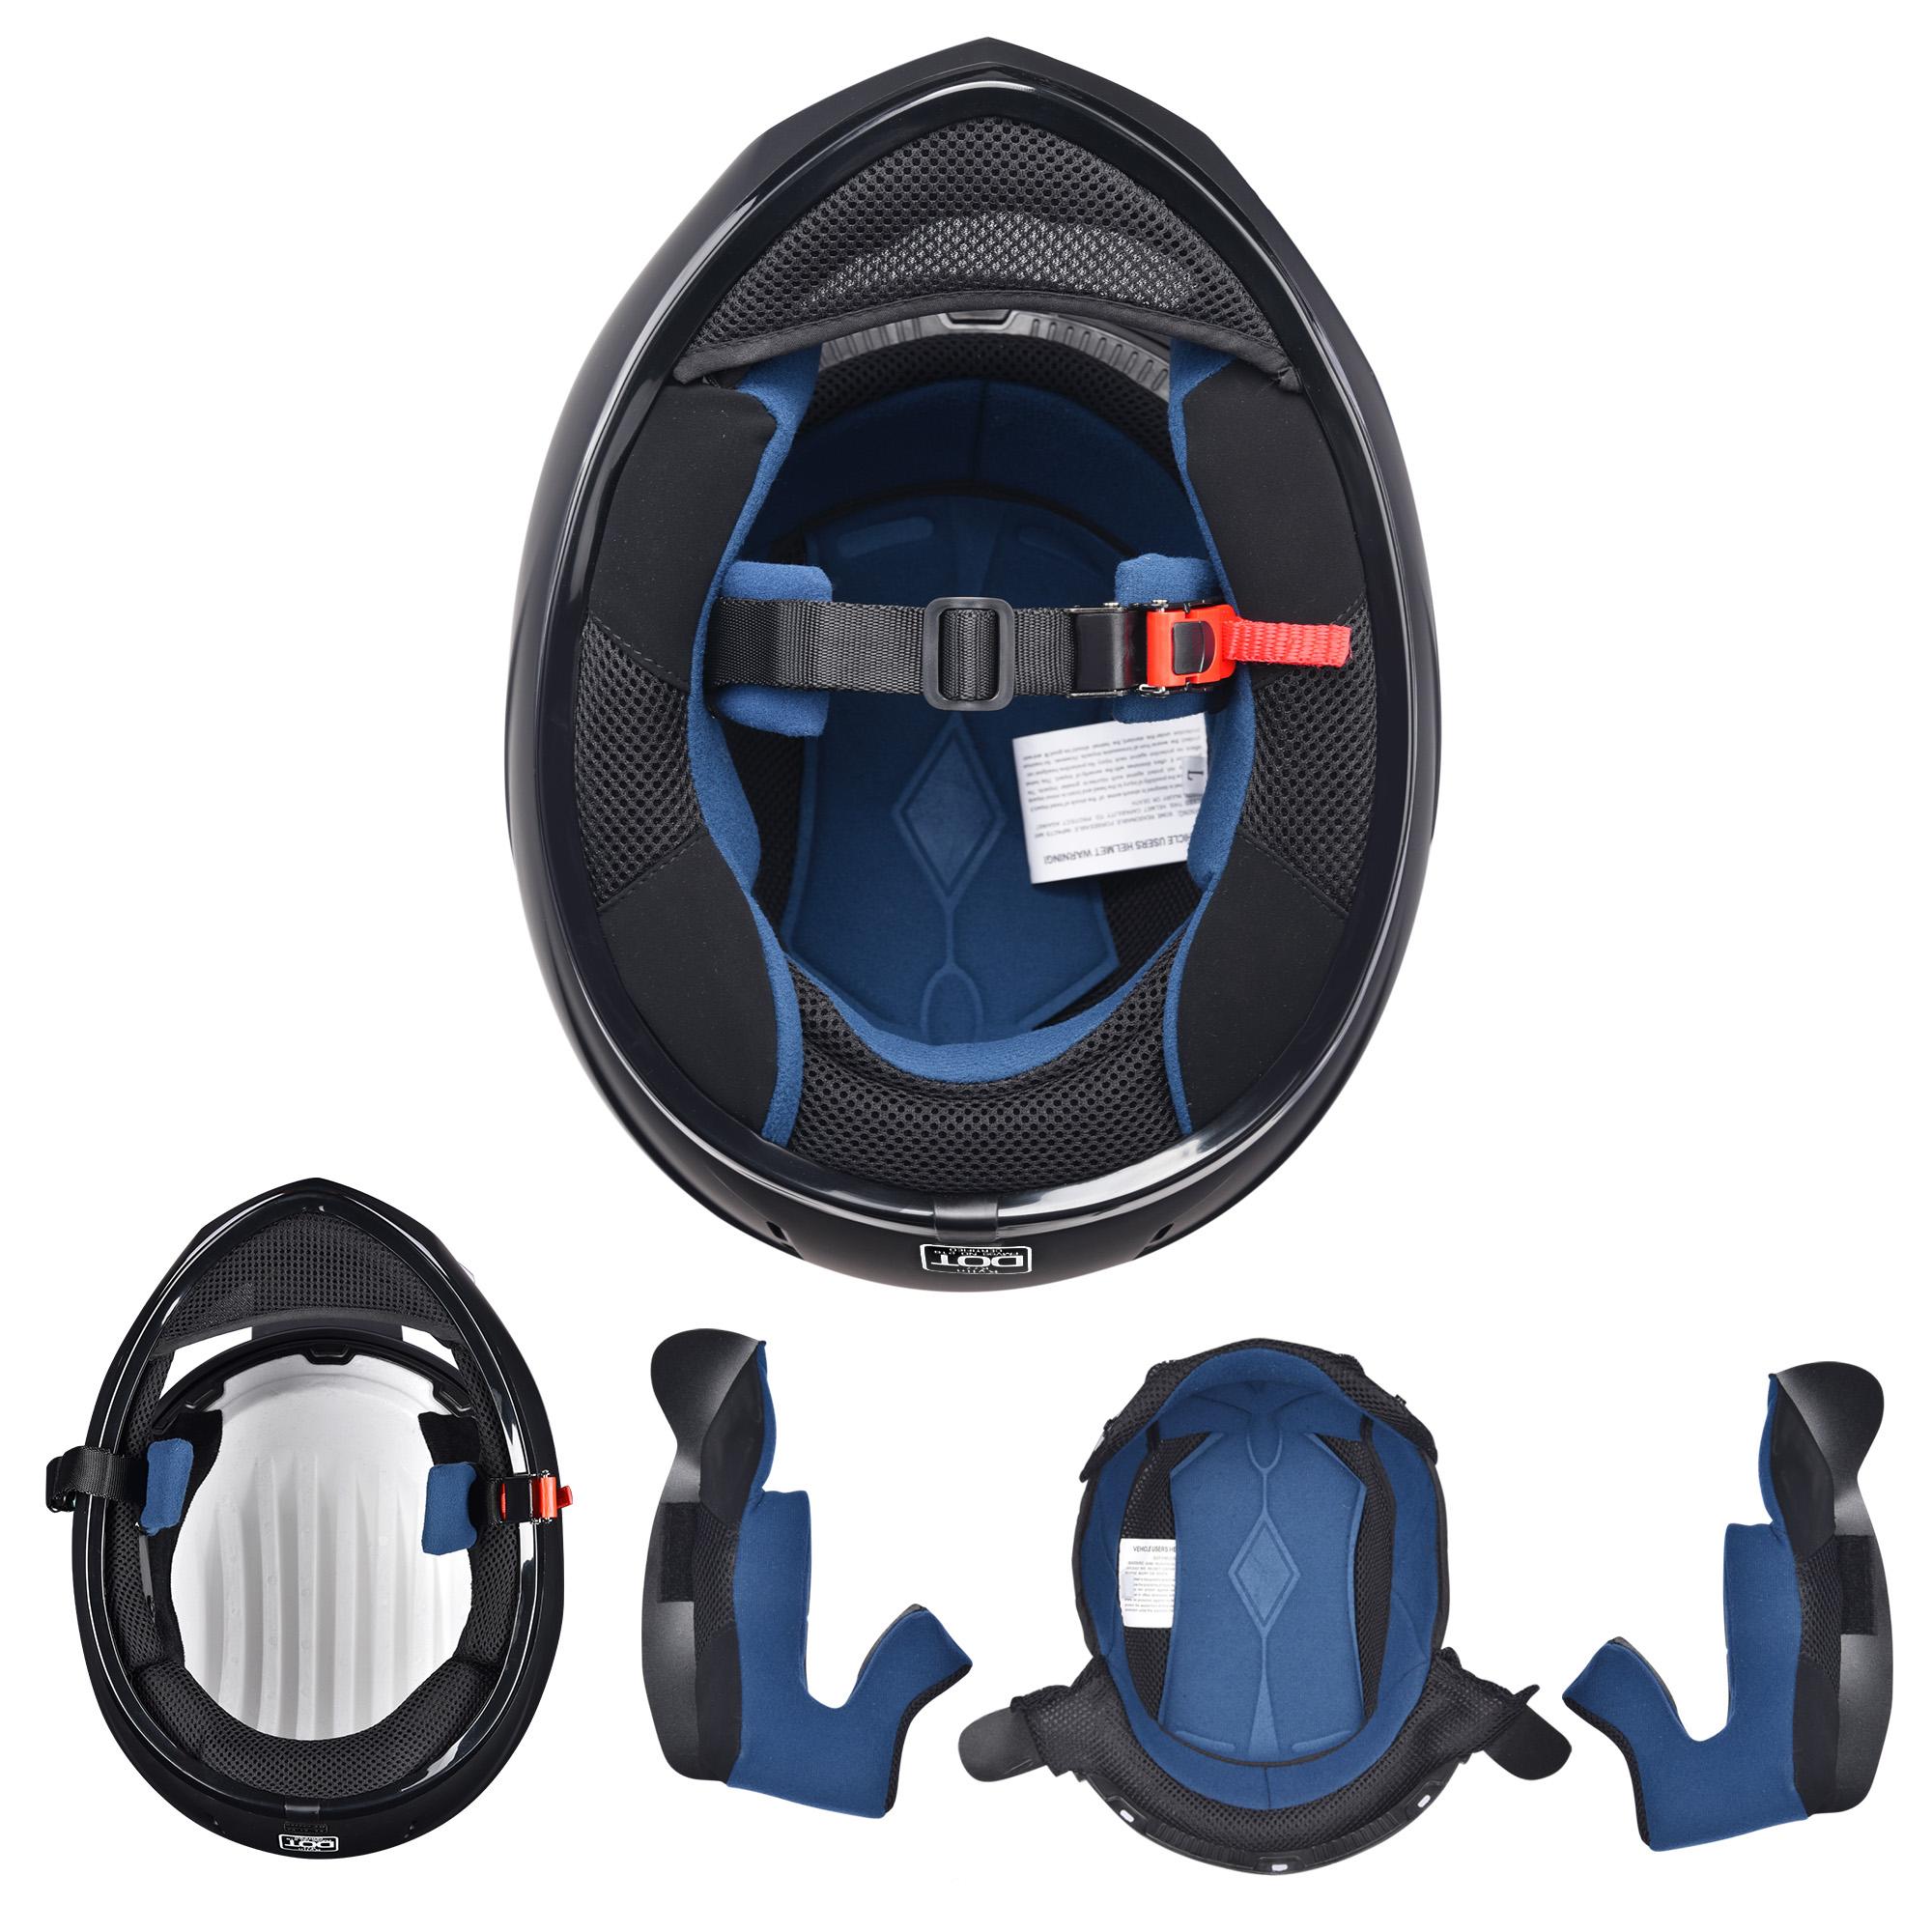 miniature 33 - AHR K12 Full Face Motorcycle Helmet DOT Air Vents Clear Visor Racing S M L XL